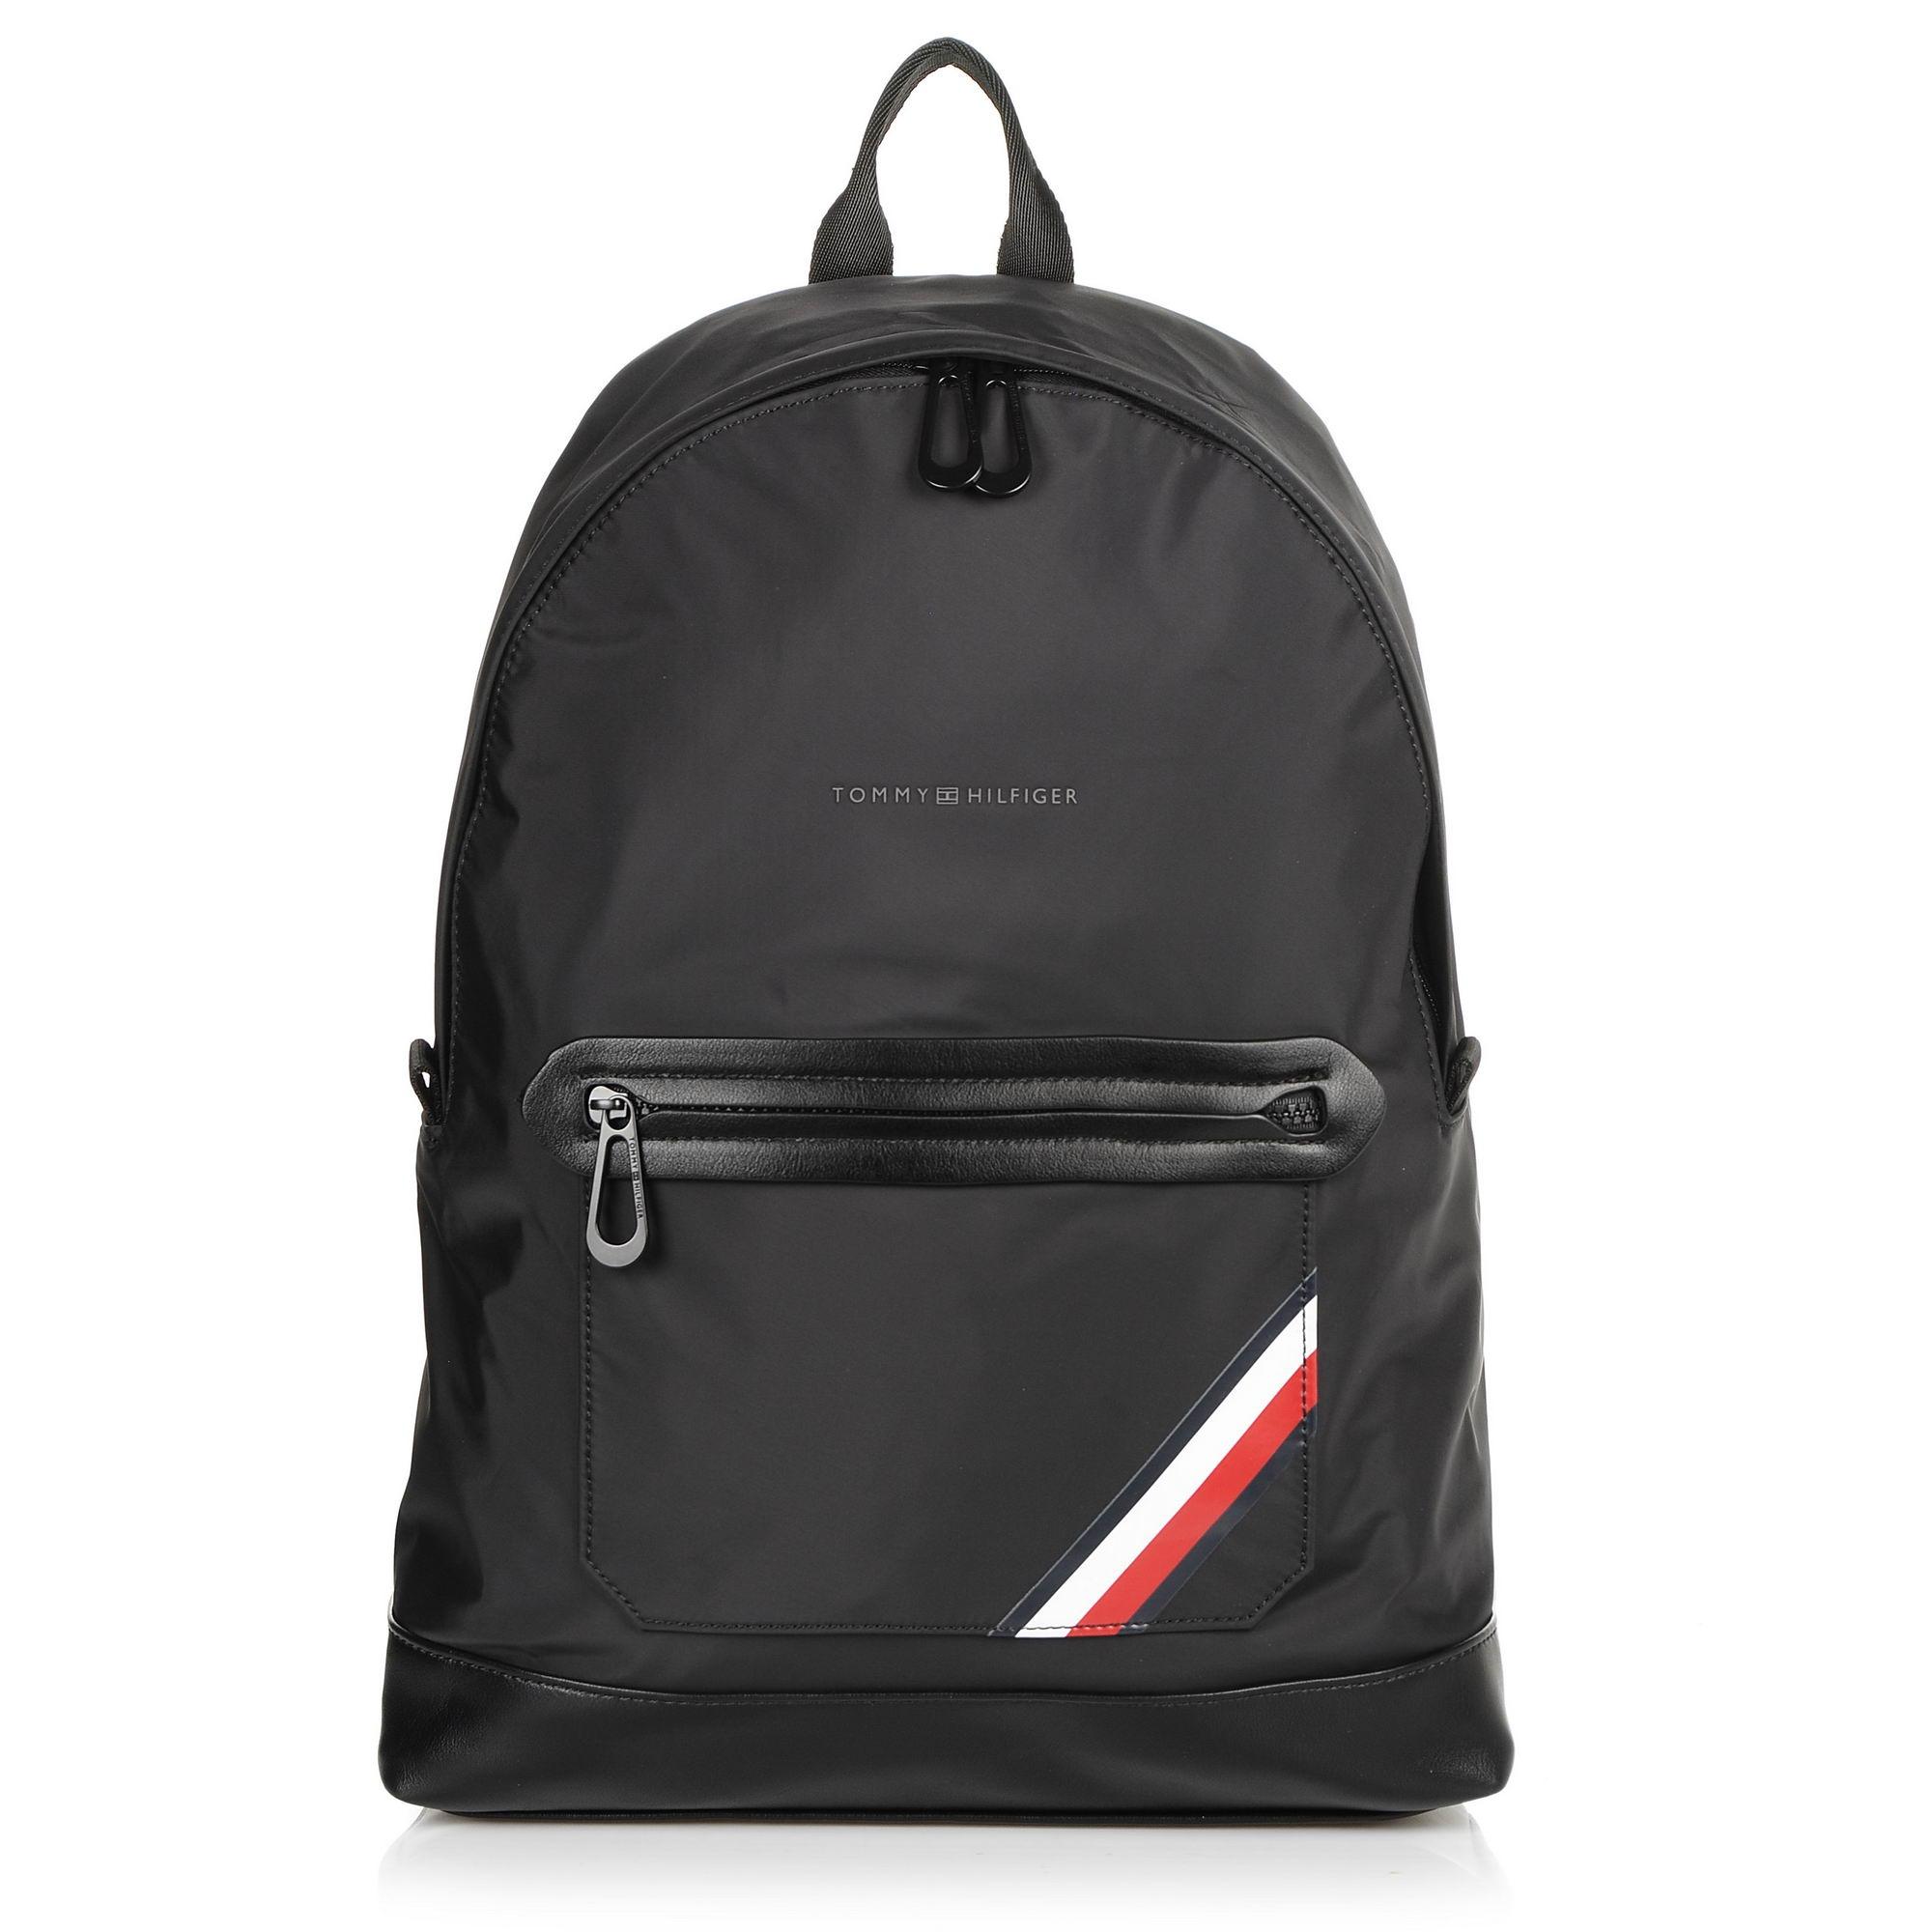 959dc171b50 Σακίδιο Πλάτης Tommy Hilfiger Easy Nylon Backpack AM0AM03594 ...